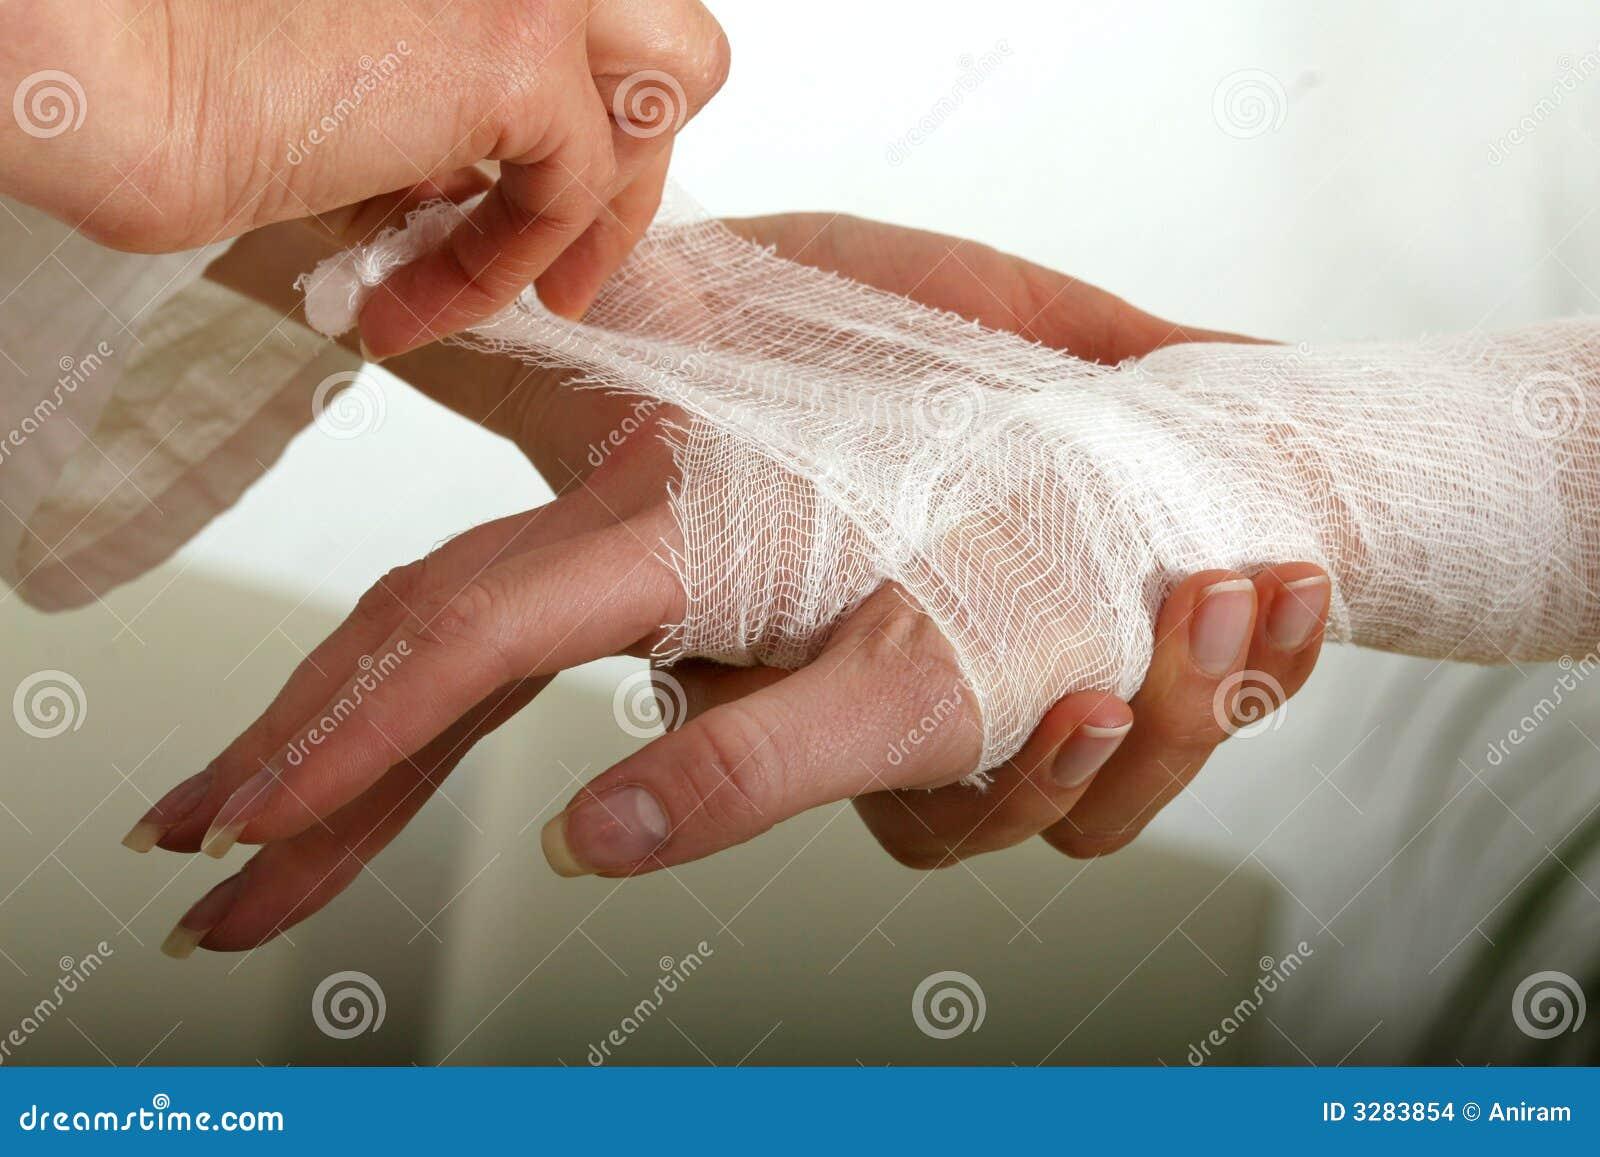 Bandage for hand